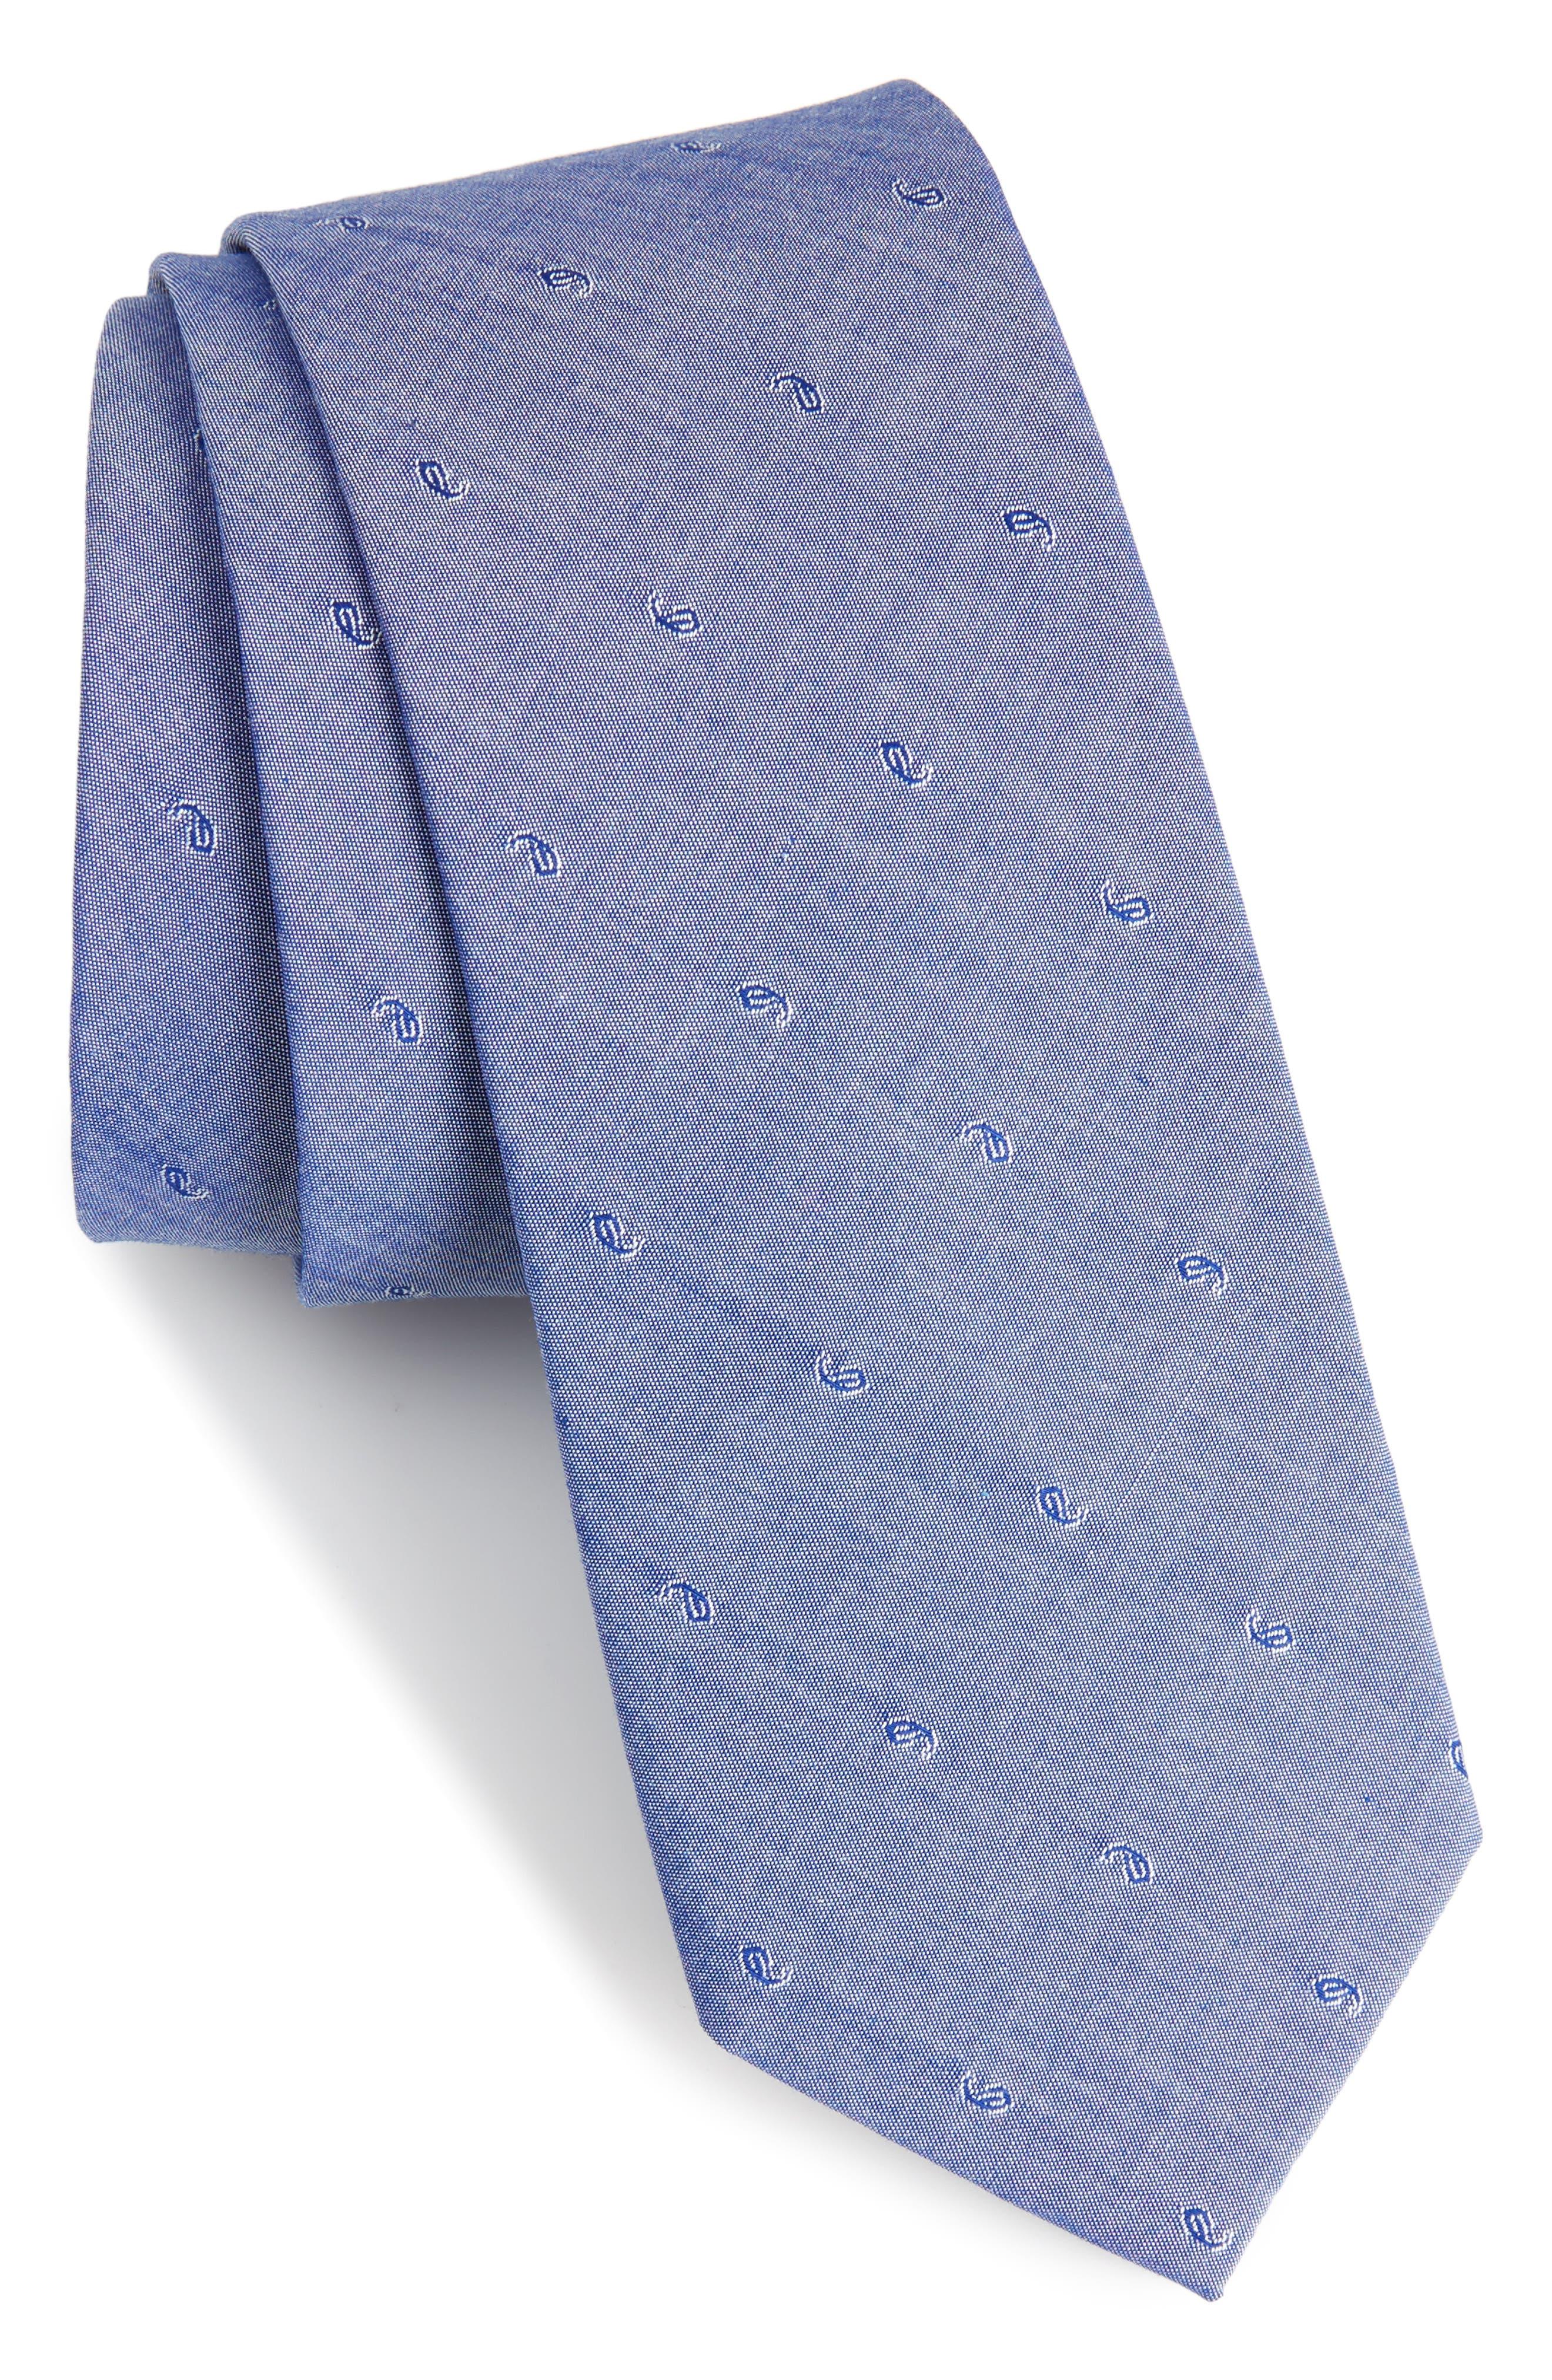 Indigo Pine Cotton Skinny Tie,                         Main,                         color,